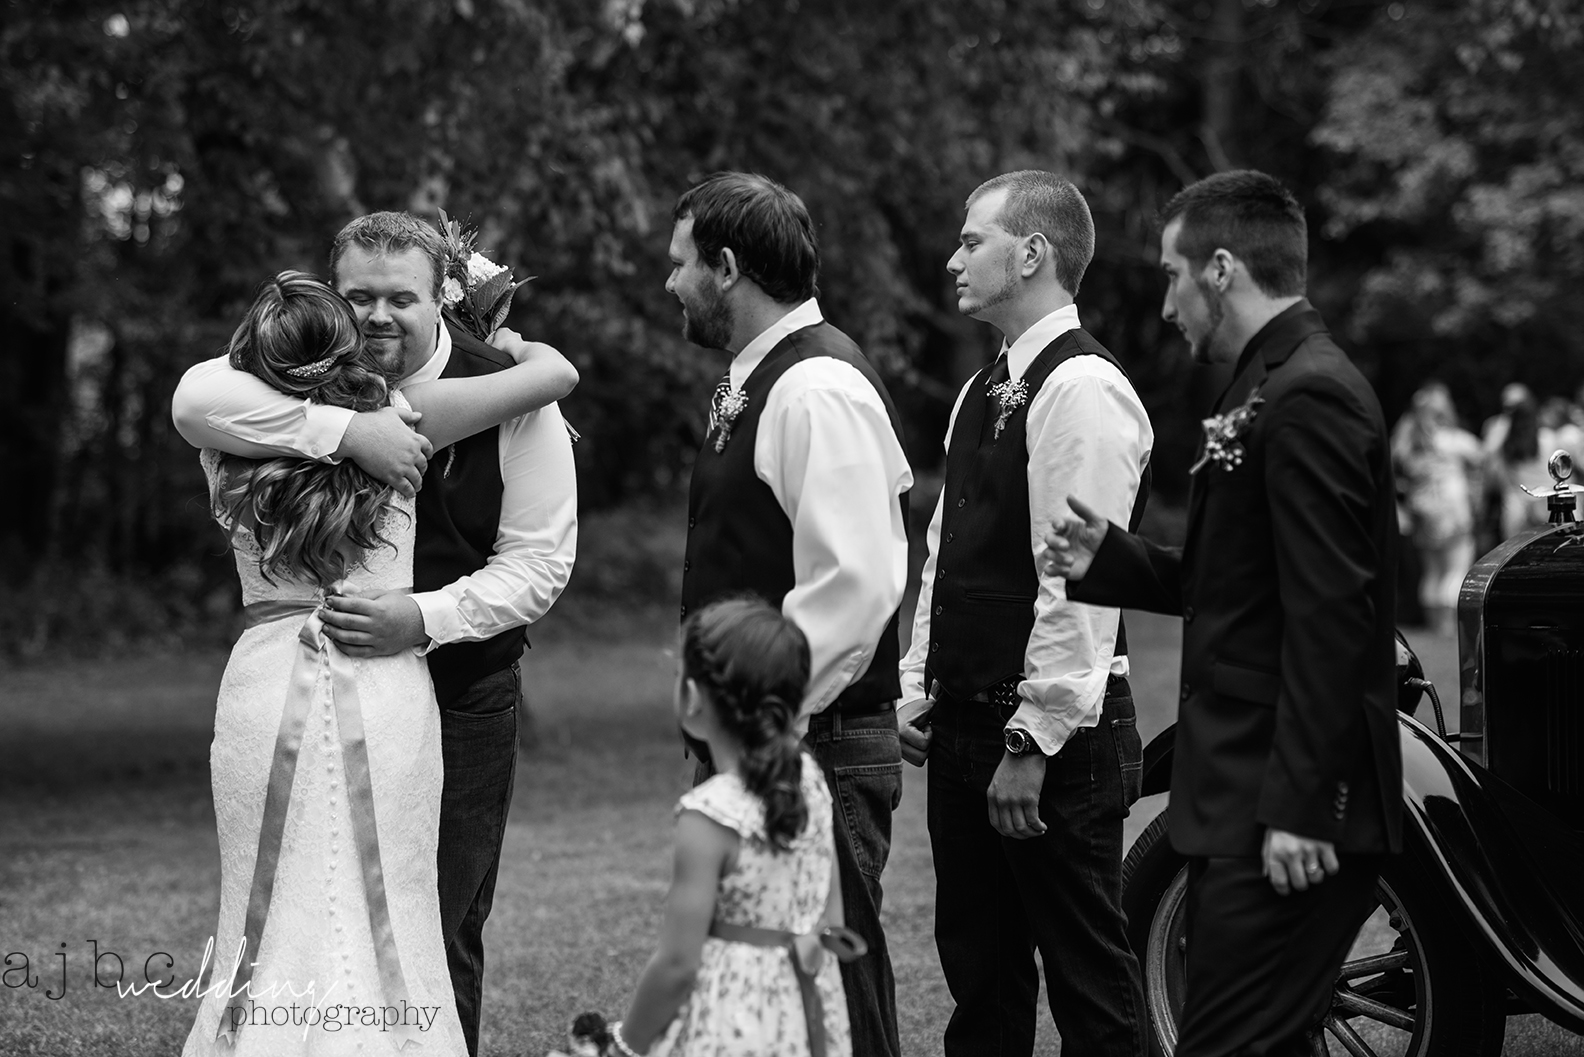 ajbcphotography-port-huron-michigan-wedding-photographer-outdoors-summer-wedding-country-wedding-wadhams-michigan-bride-vintage-wedding-groom-bride.jpg